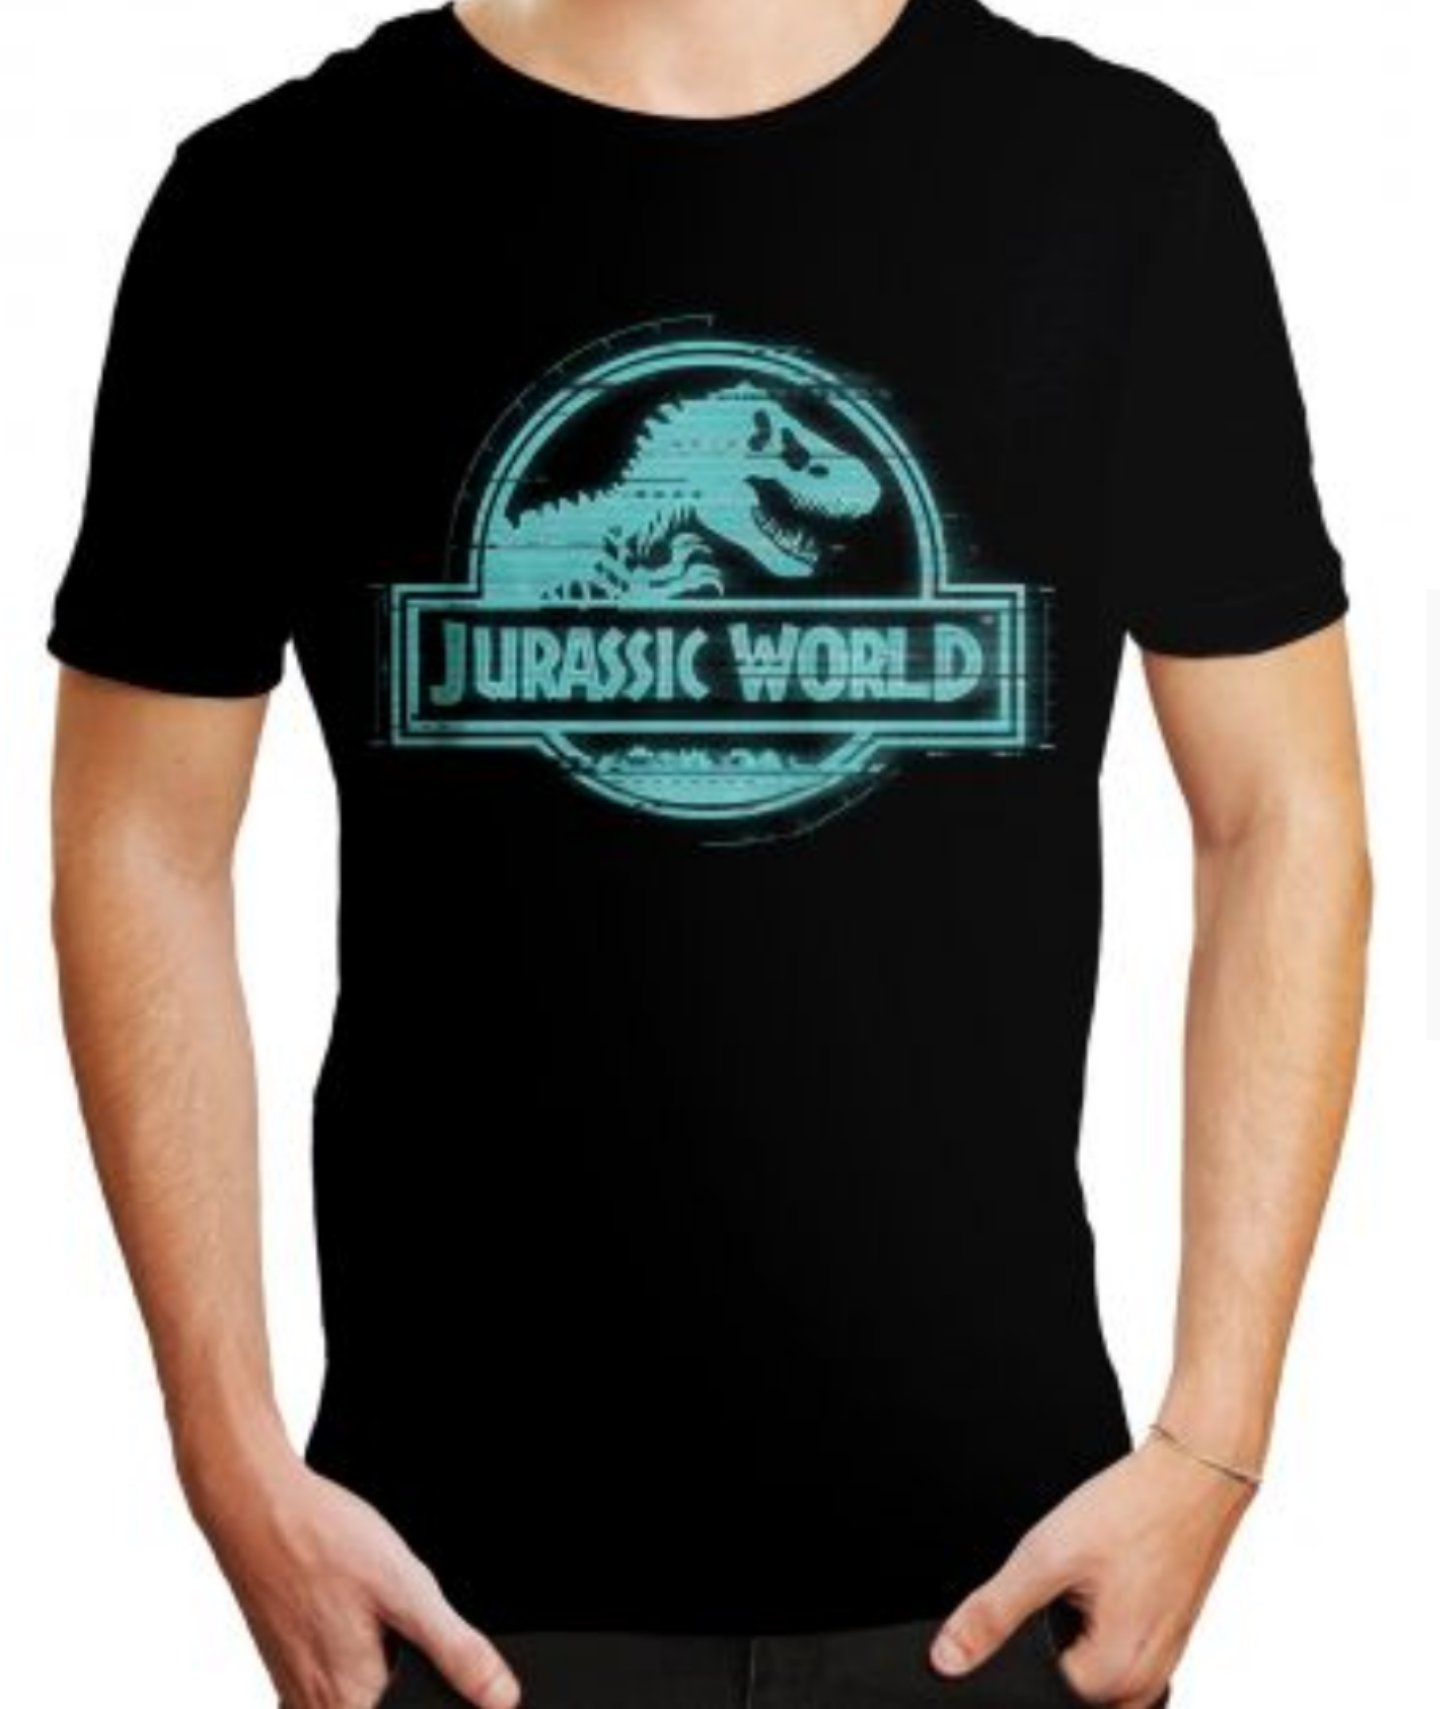 Tshirt jurassic world logo